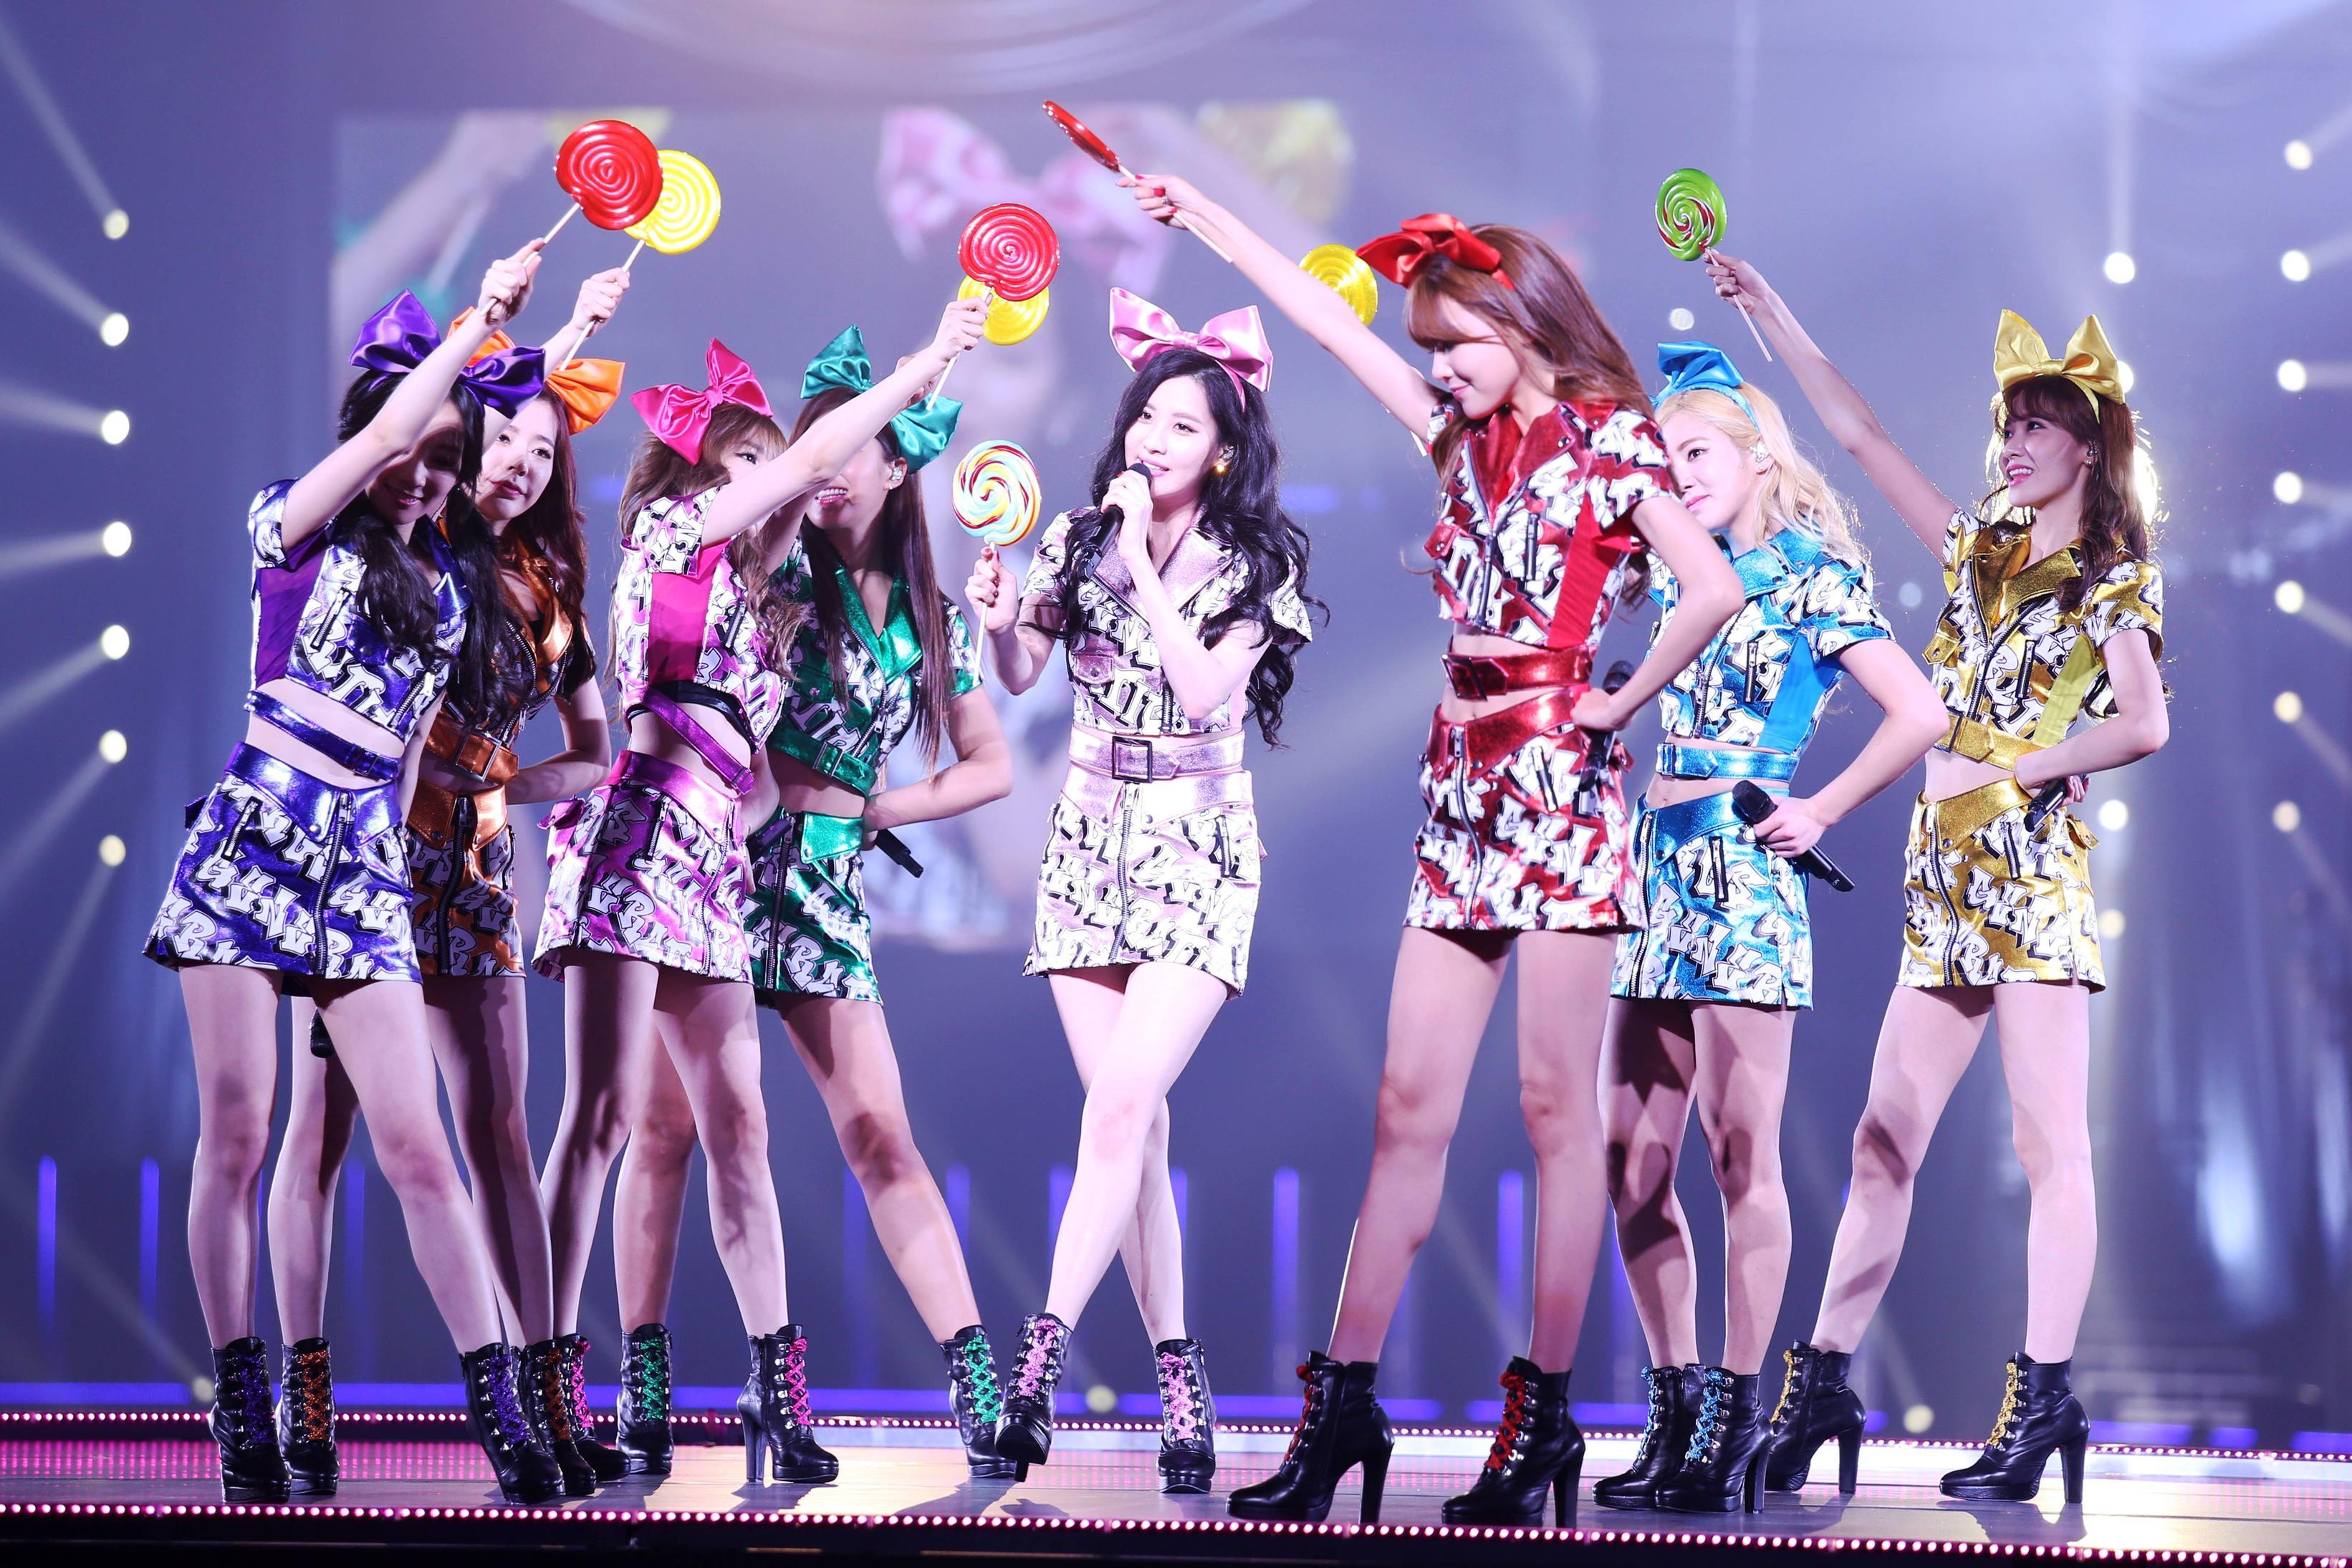 Return Of The Spice Girls Wallpaper Girls Generation Ranks 4th Worldwide In Girl Group